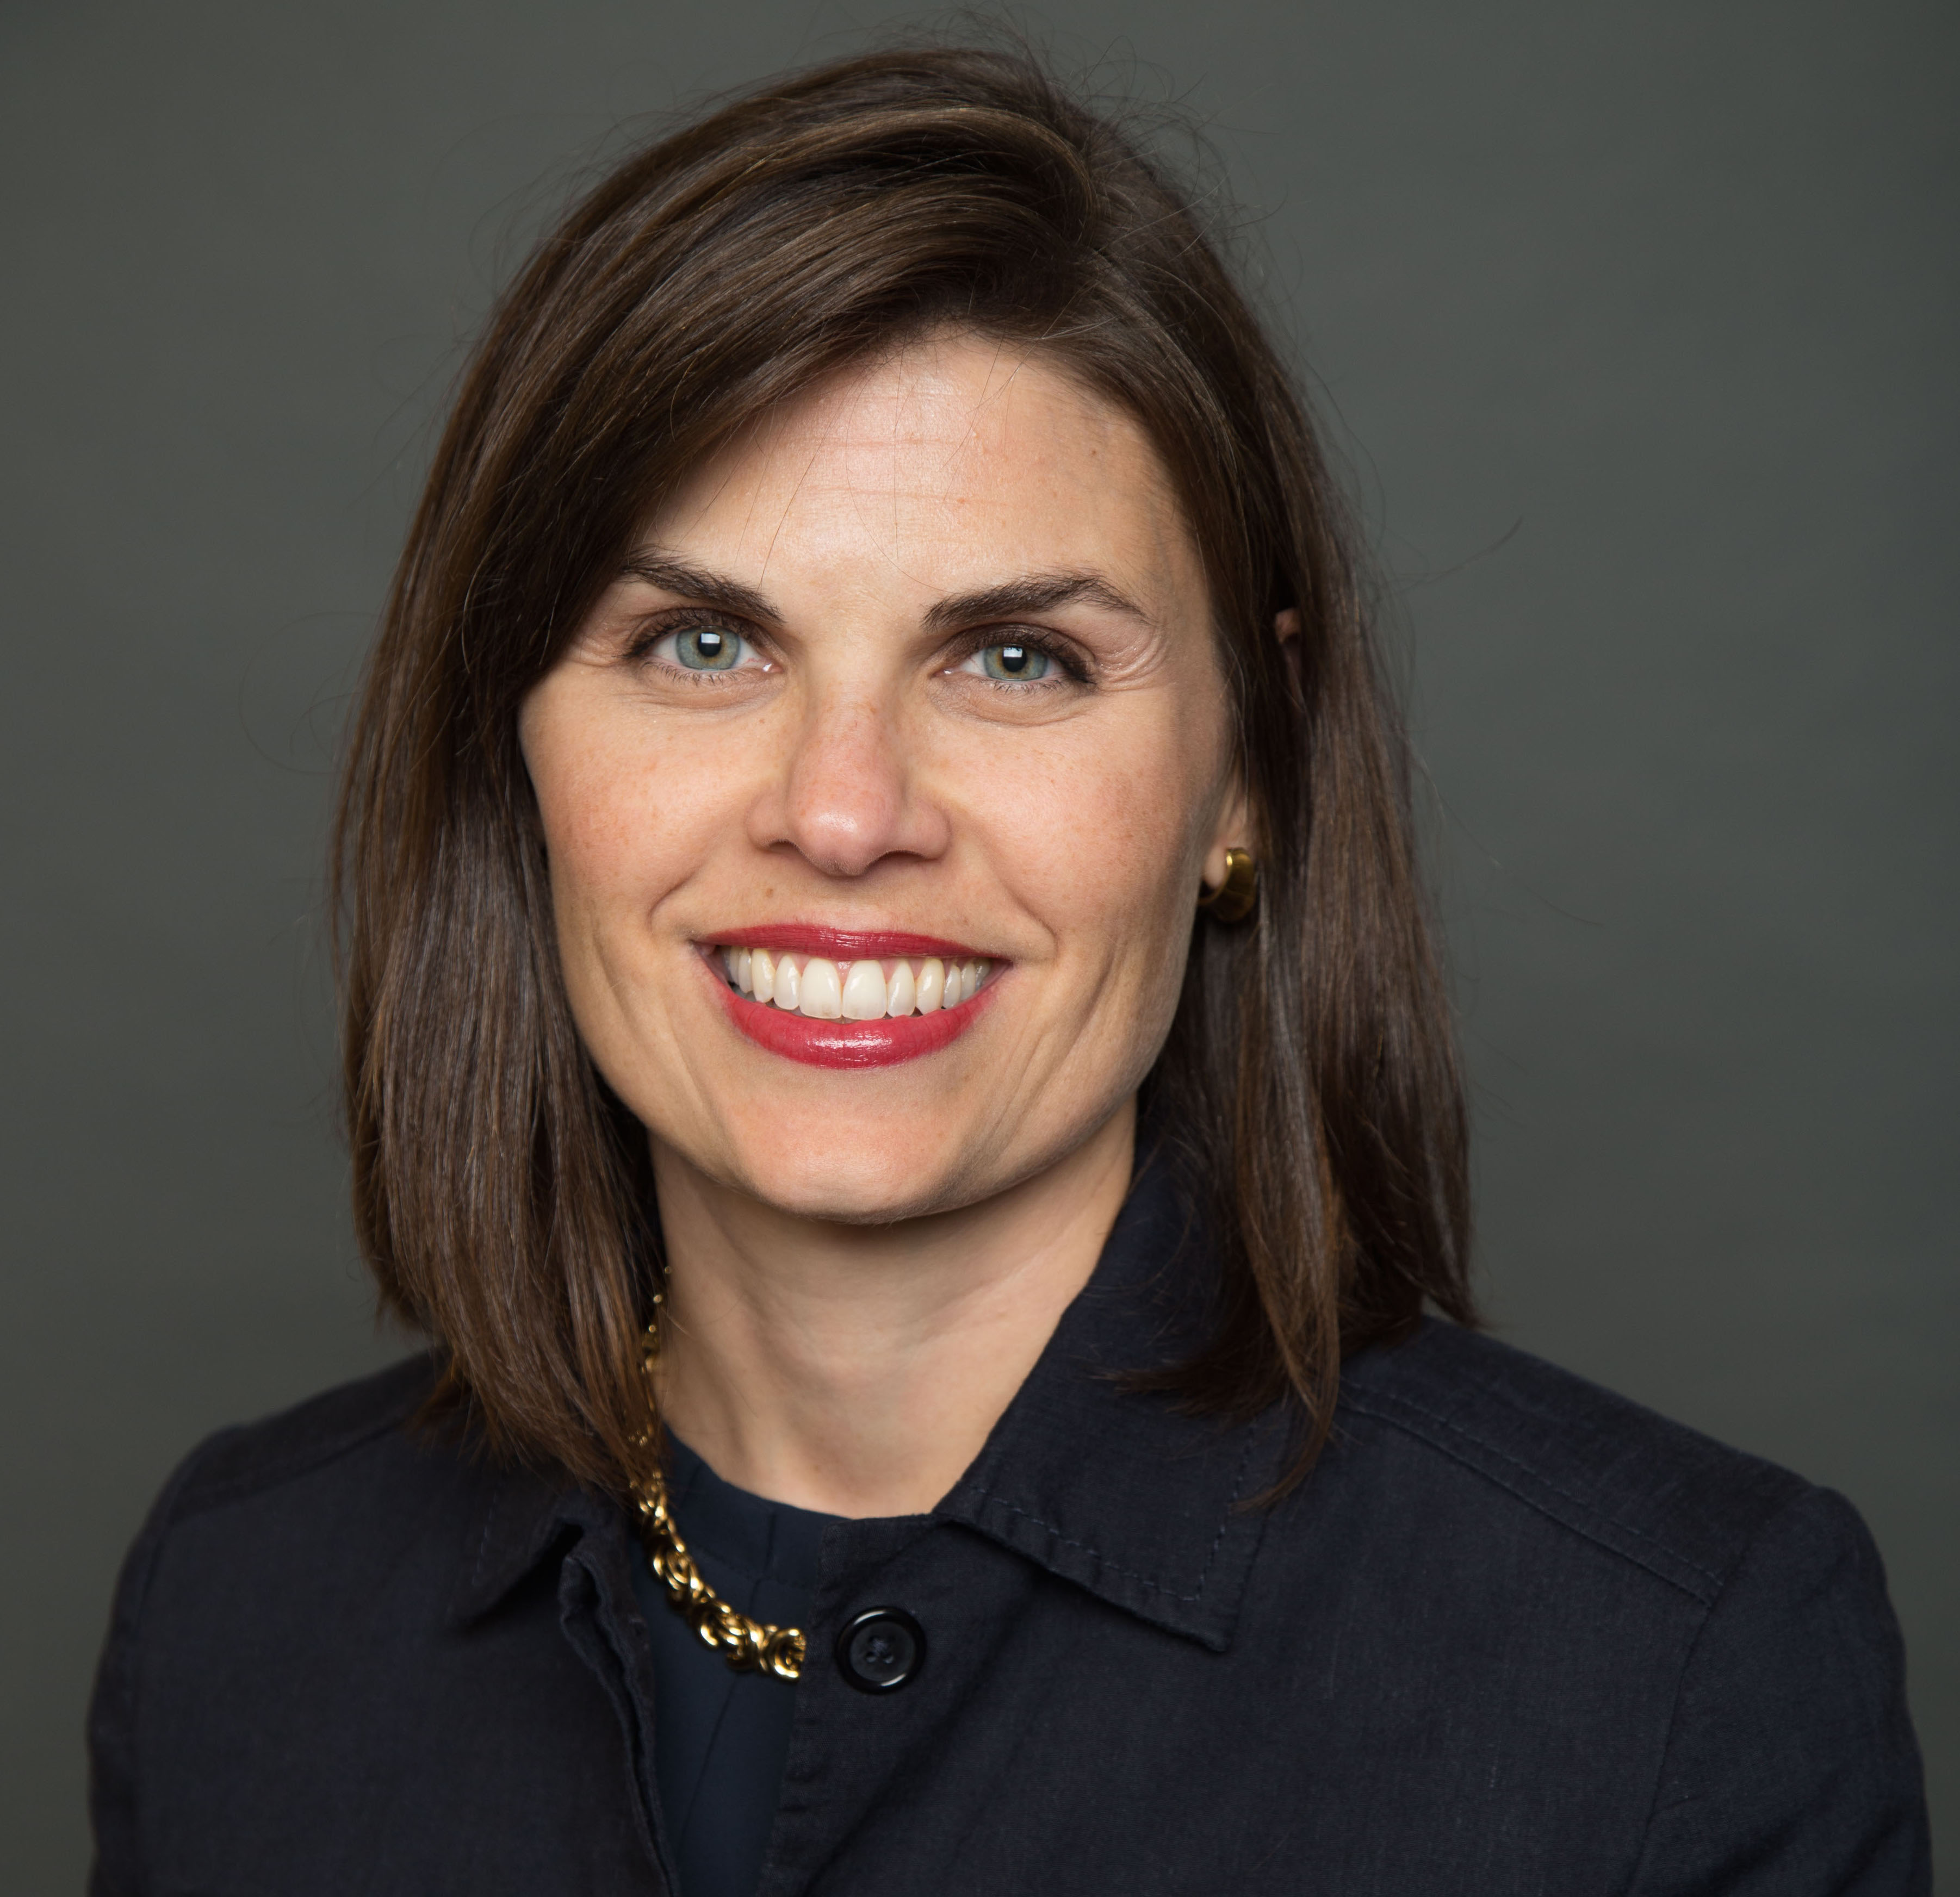 Alison Gavin - Vice President, Total Talent, Diversity & Enterprise Development, Pernod Ricard USA